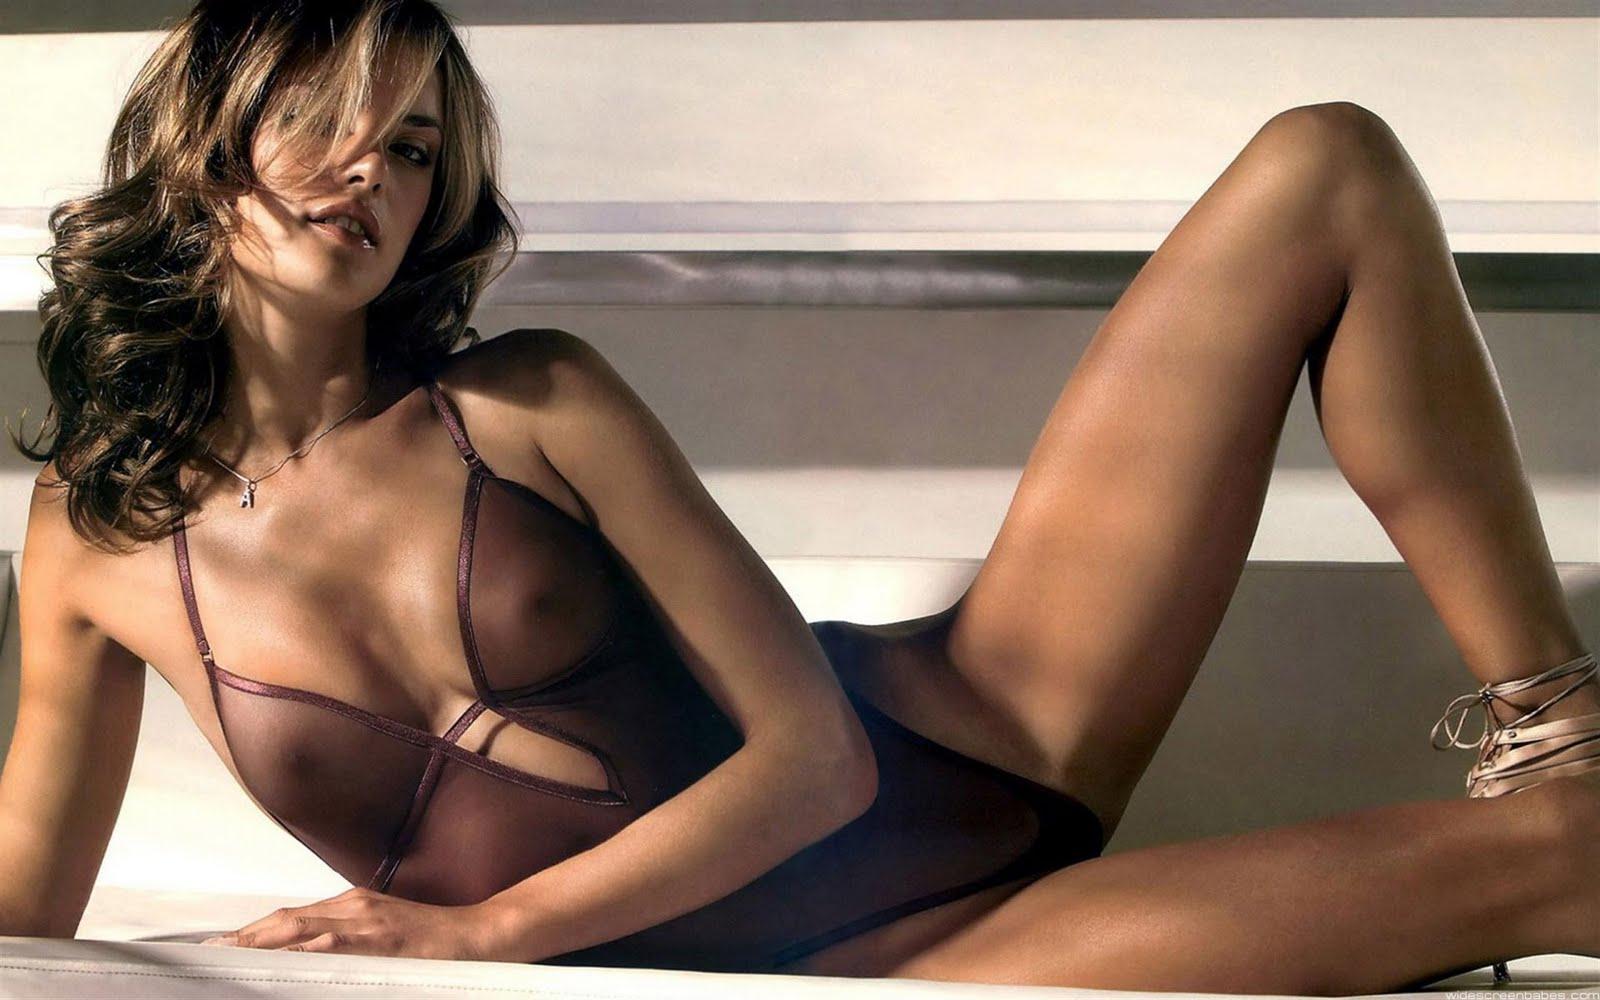 http://4.bp.blogspot.com/-Xa8udqGAE_Q/TX-3hWoNTYI/AAAAAAAAGQU/-lD1agV70Q8/s1600/Alessandra%2BAmbrosio13.jpg